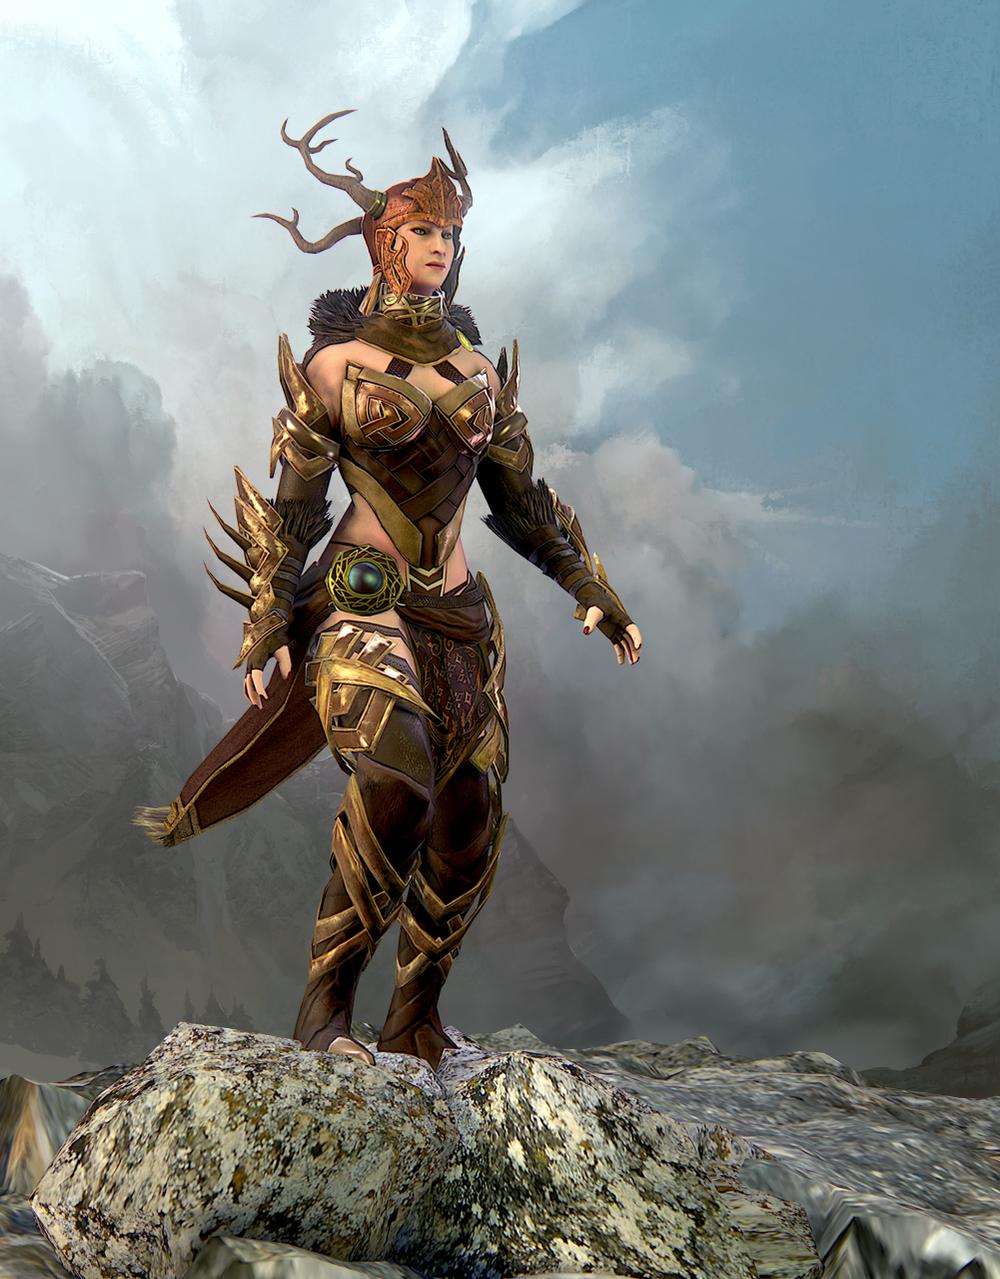 Arena-Net-Guild-Wars-Norn-Character-Art-Test-Internship-2014-Kekai-Kotaki